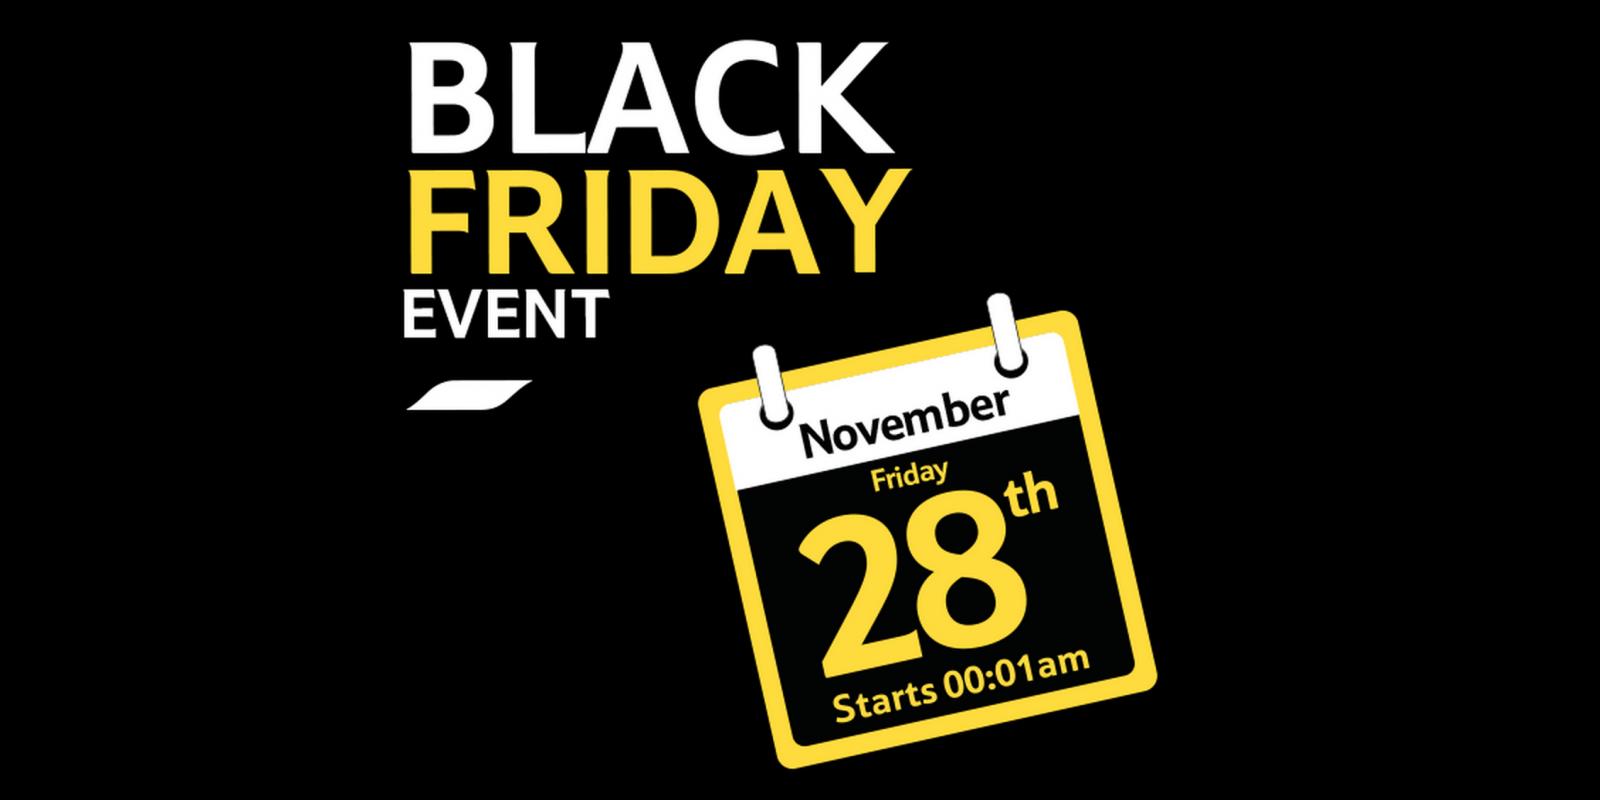 Tesco Black Friday Deals - TVs, Games Consoles, Coffee Machines